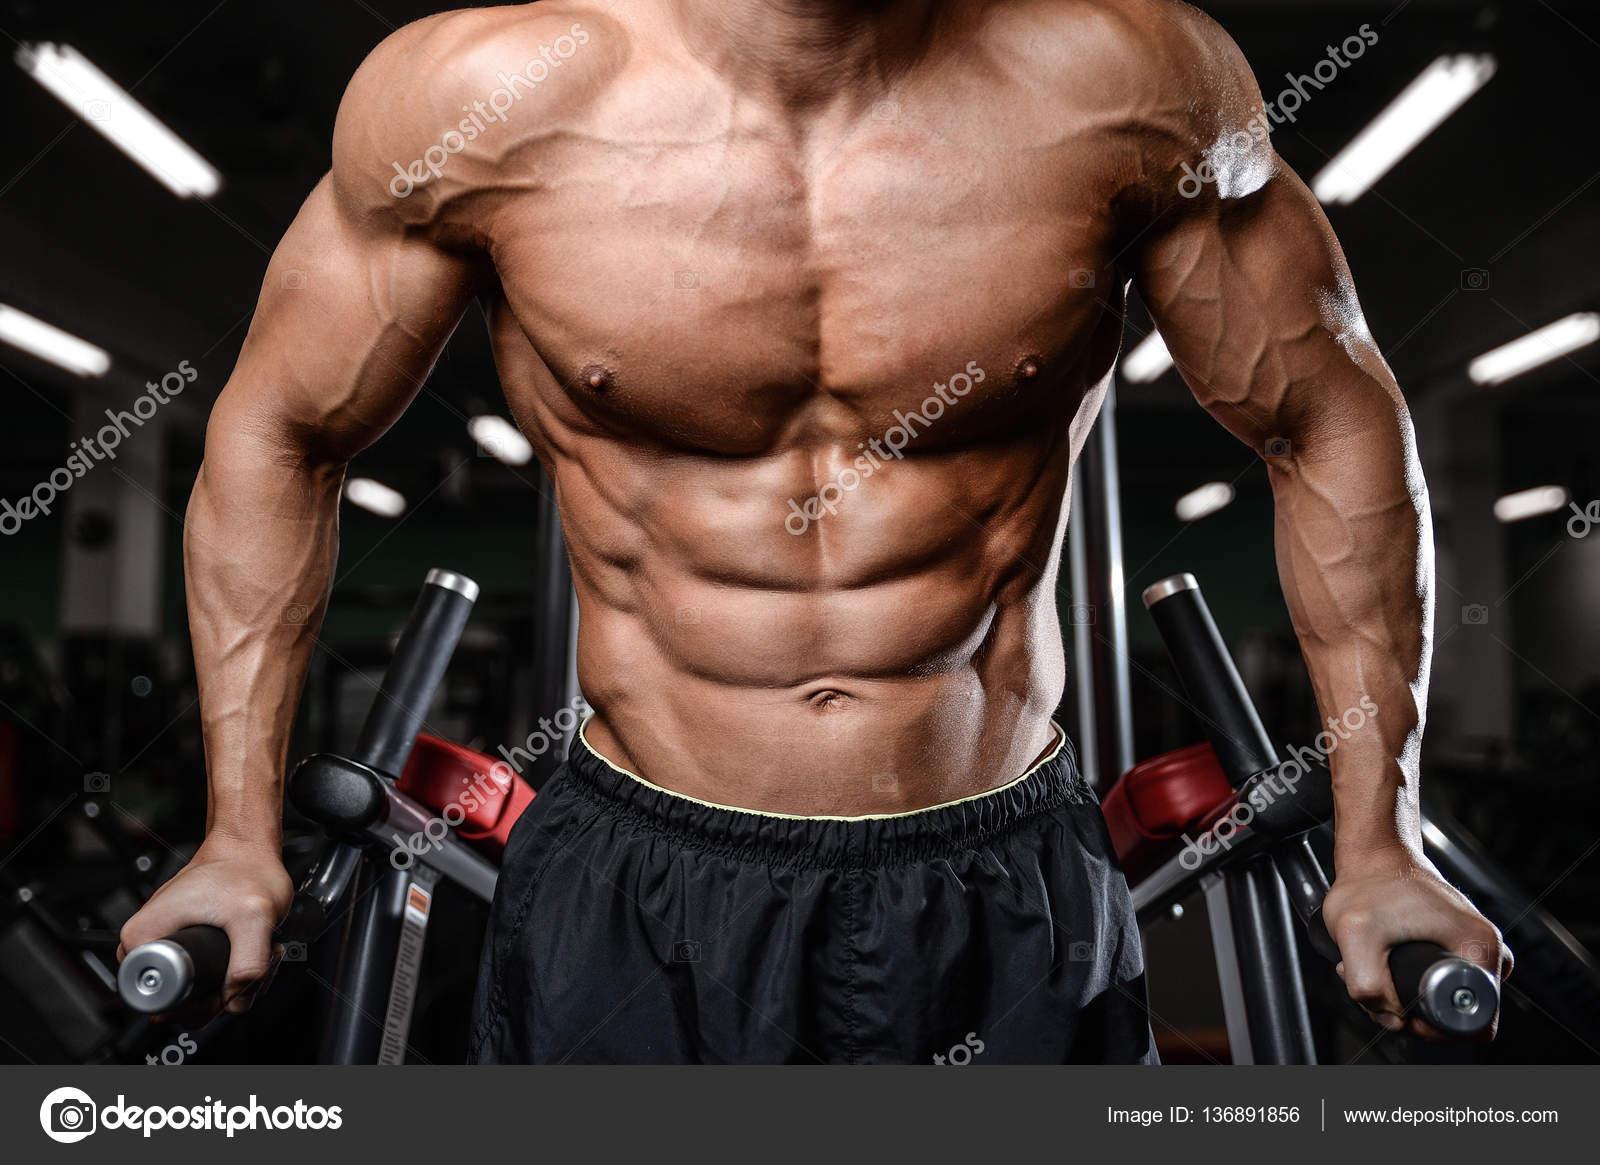 Nahé fitness model pics